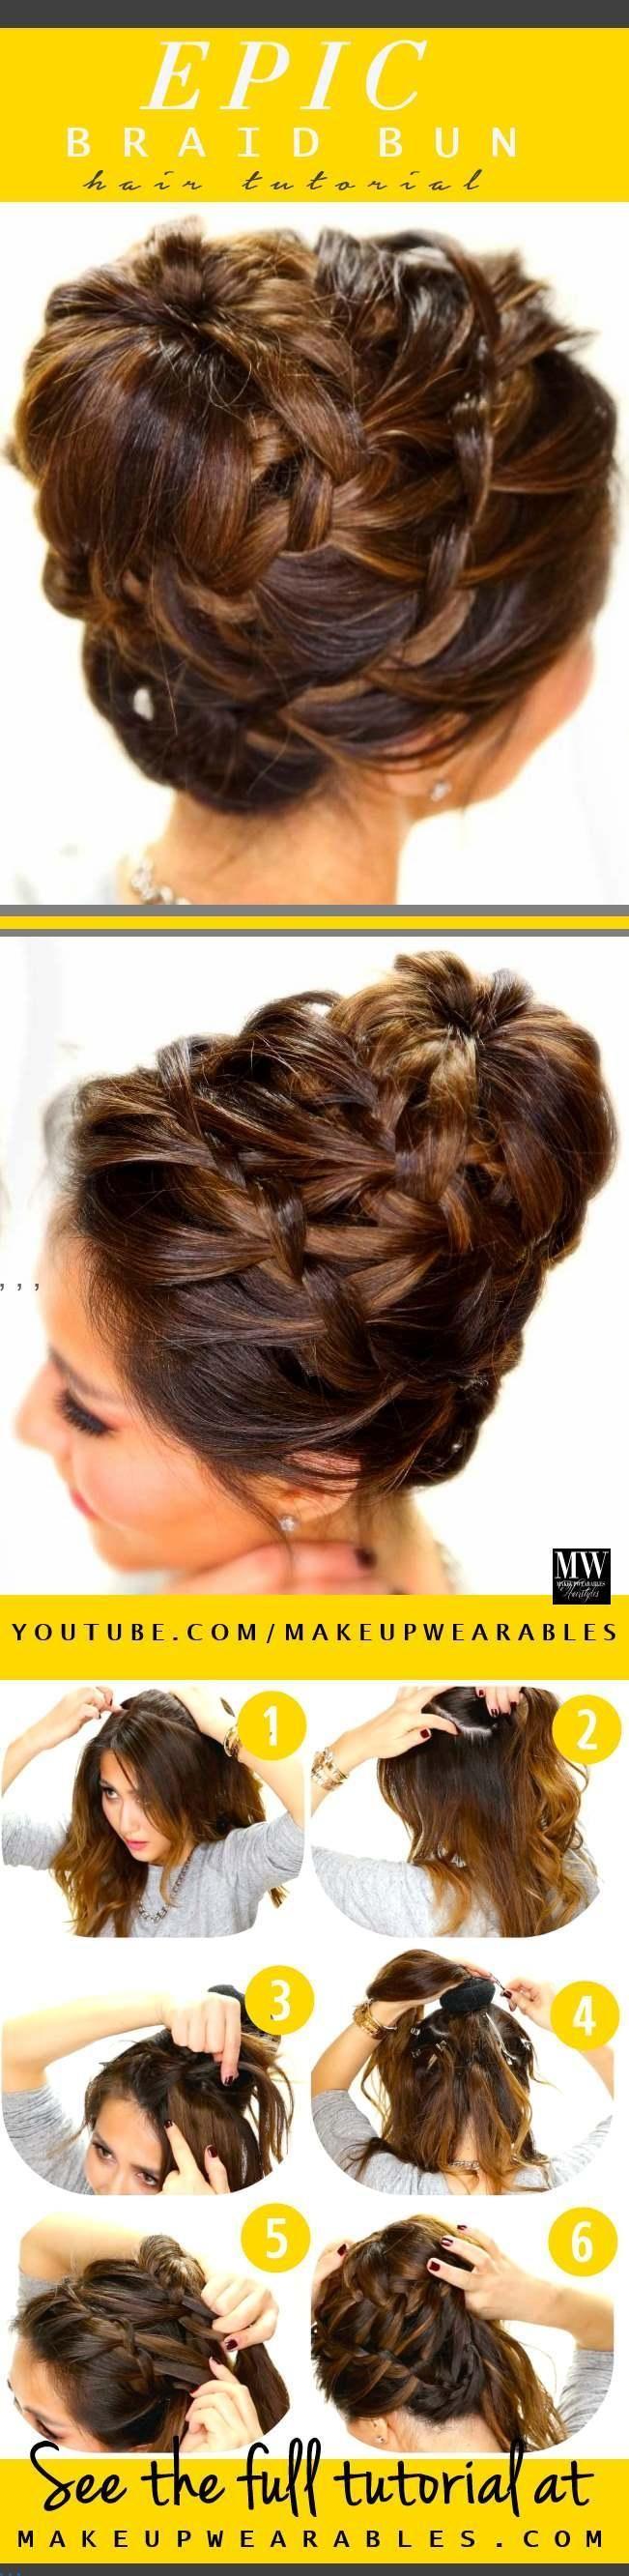 Epic braid bun style pretty updo hairstyles f do it